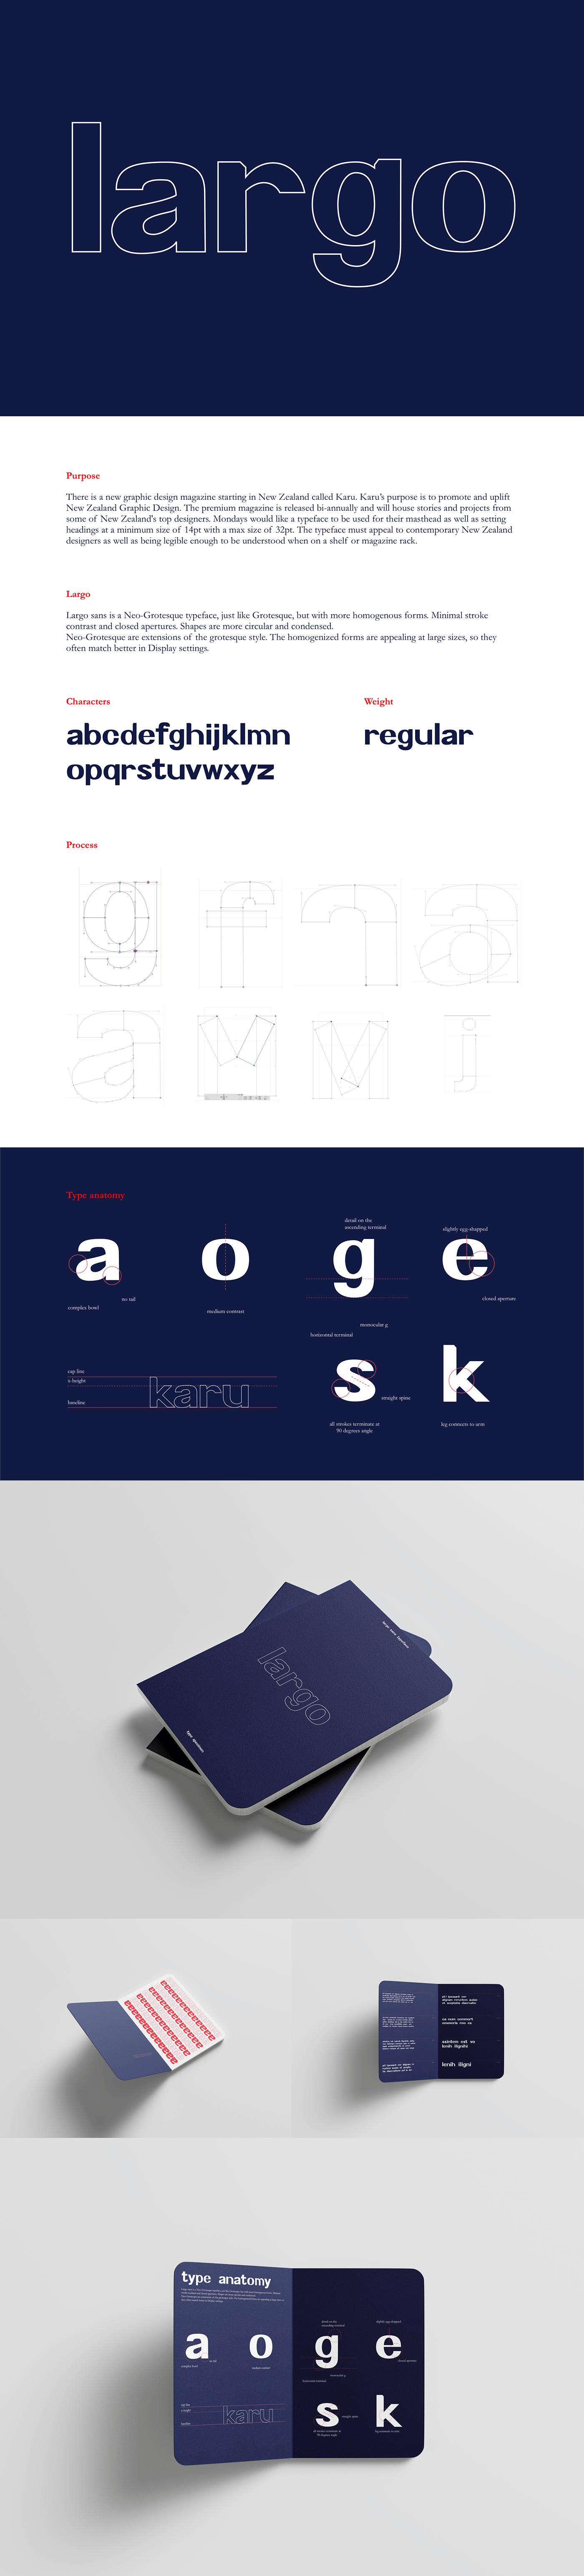 font grotesque neo-grotesque sans sans serif type Type Anatomy Type Specimen Typeface typography